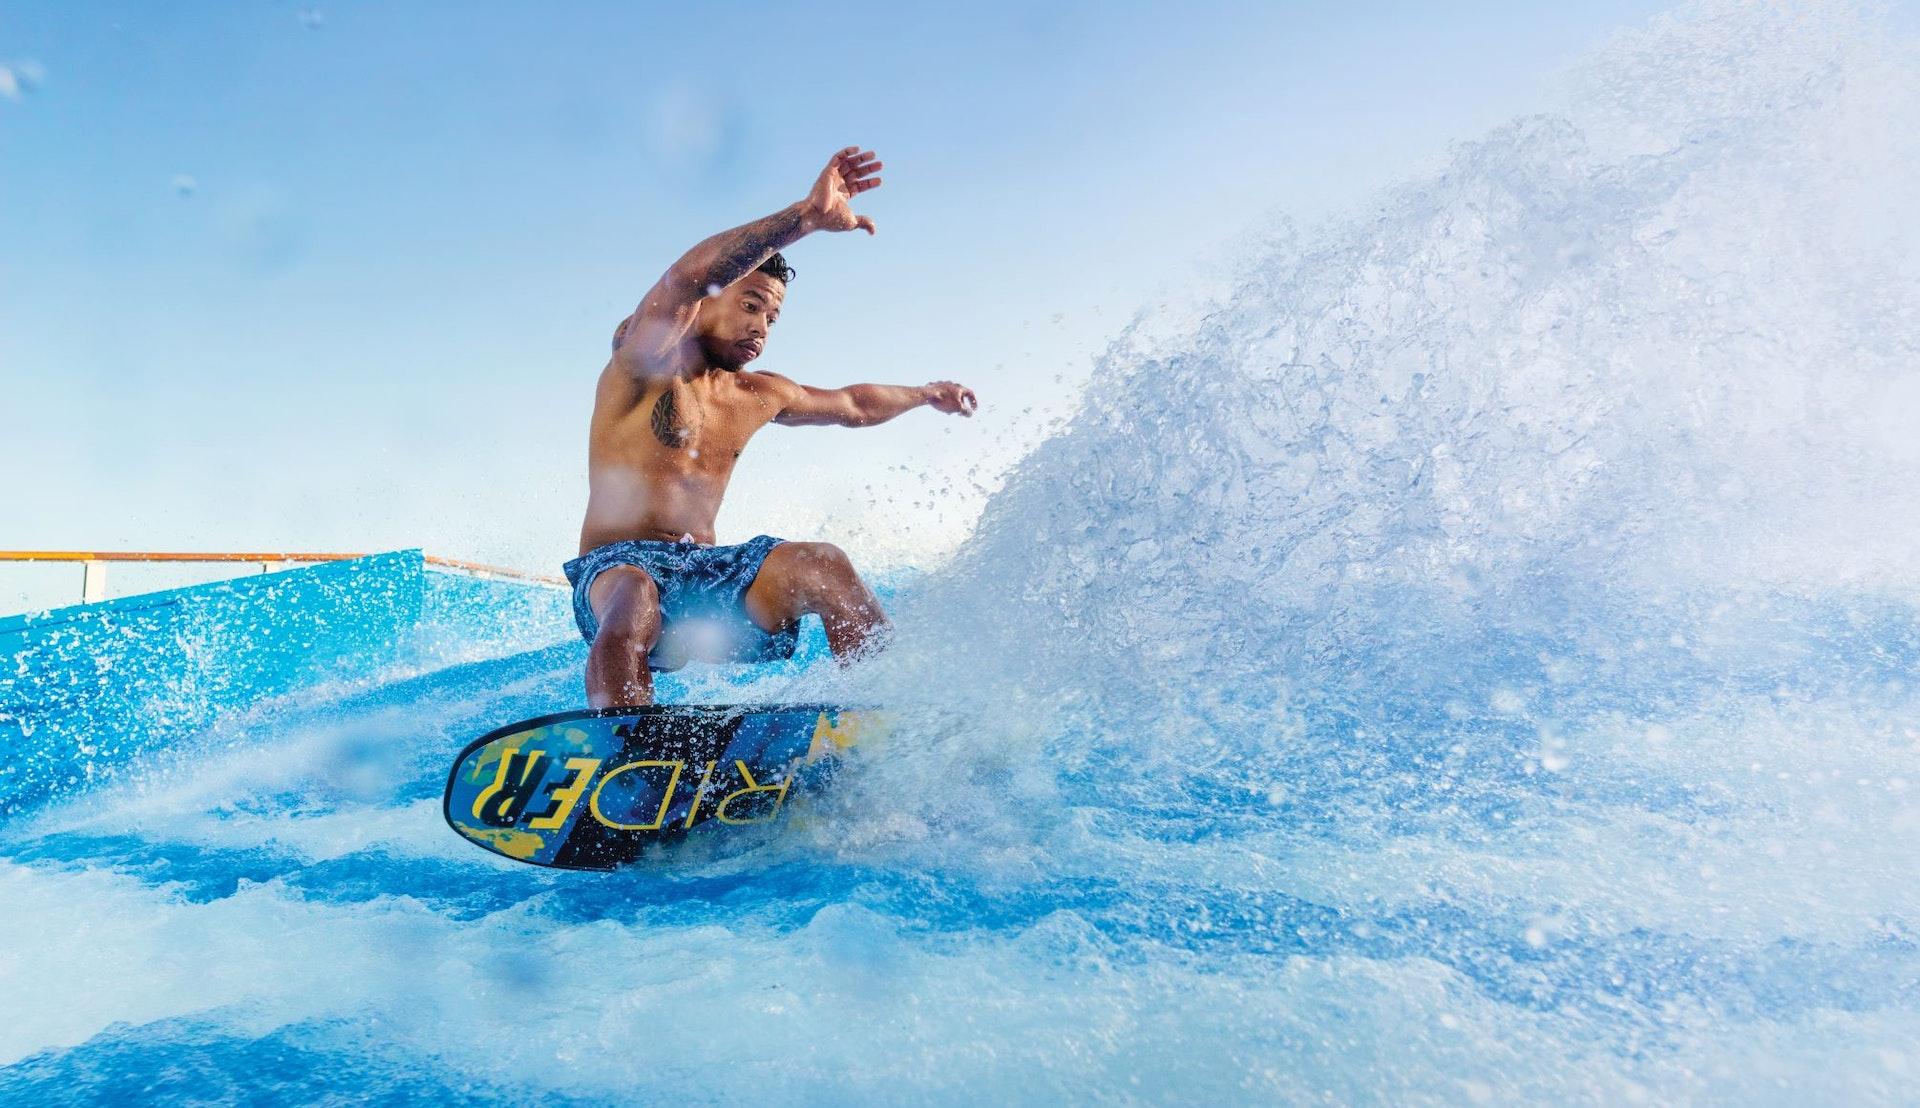 Surffauskone risteilylaiva